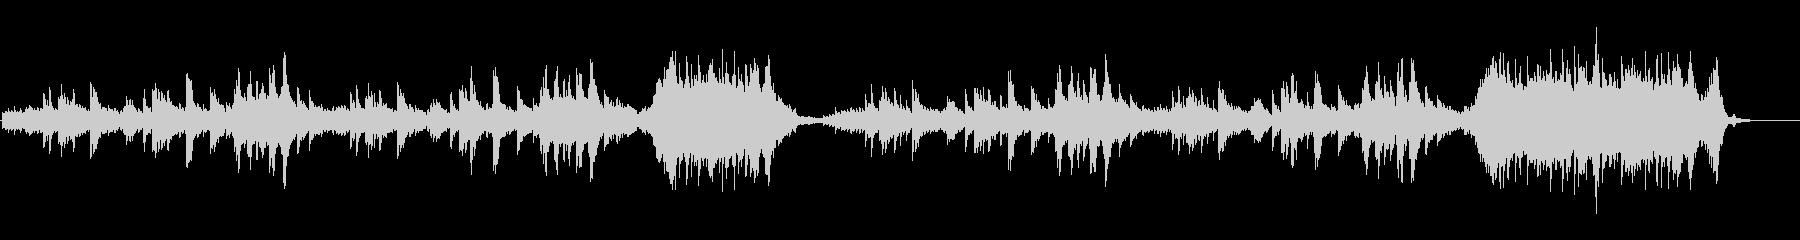 RAINY DAYS/レイニー・デイズの未再生の波形